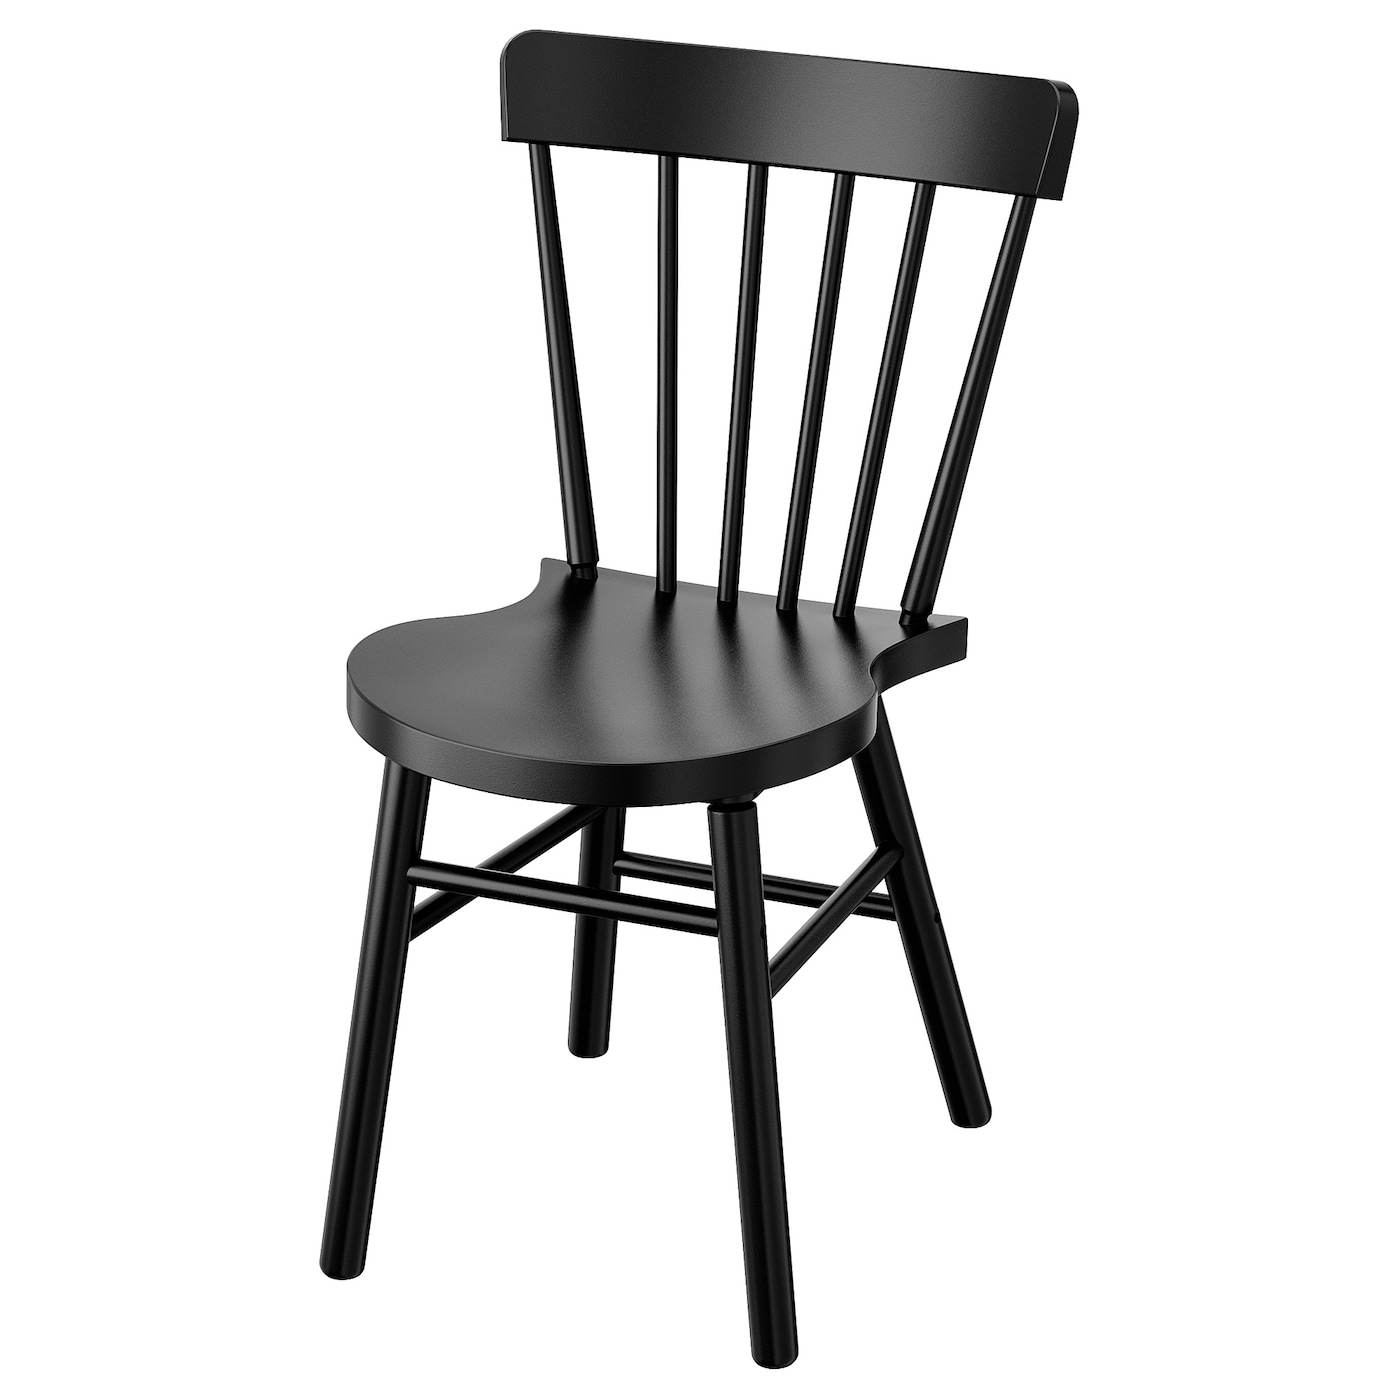 ryd-chair-black__0727327_PE735599_S5